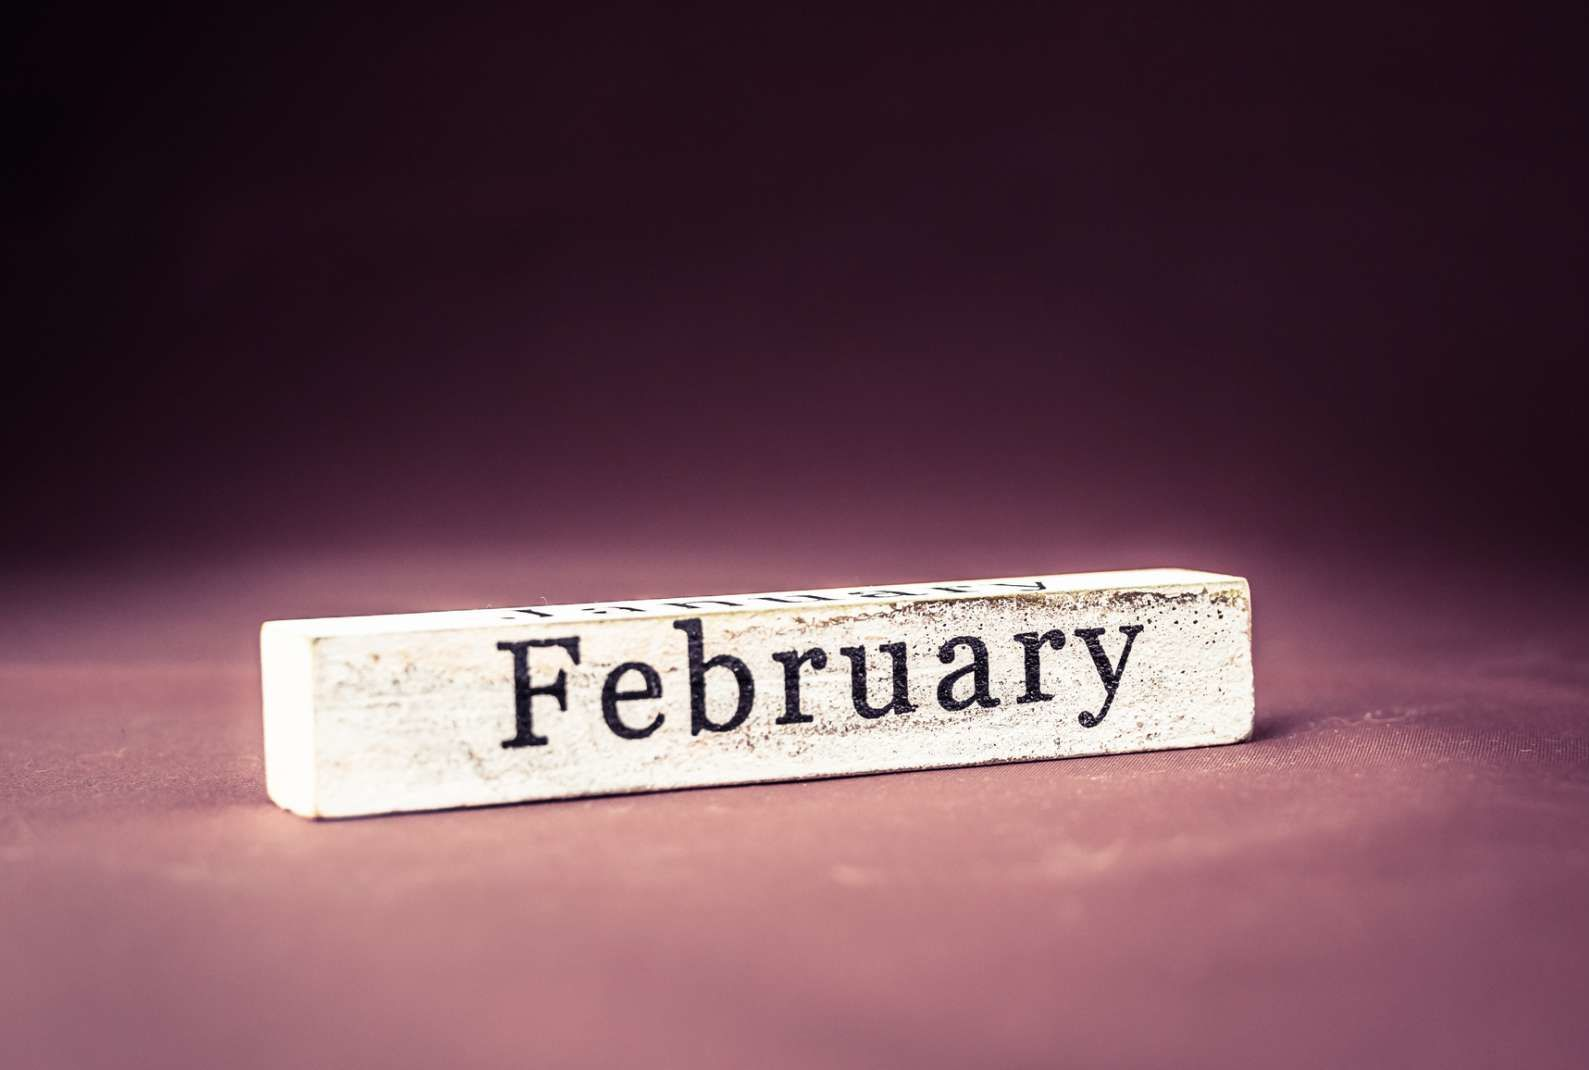 The Correct Pronunciation of February  Mental Floss